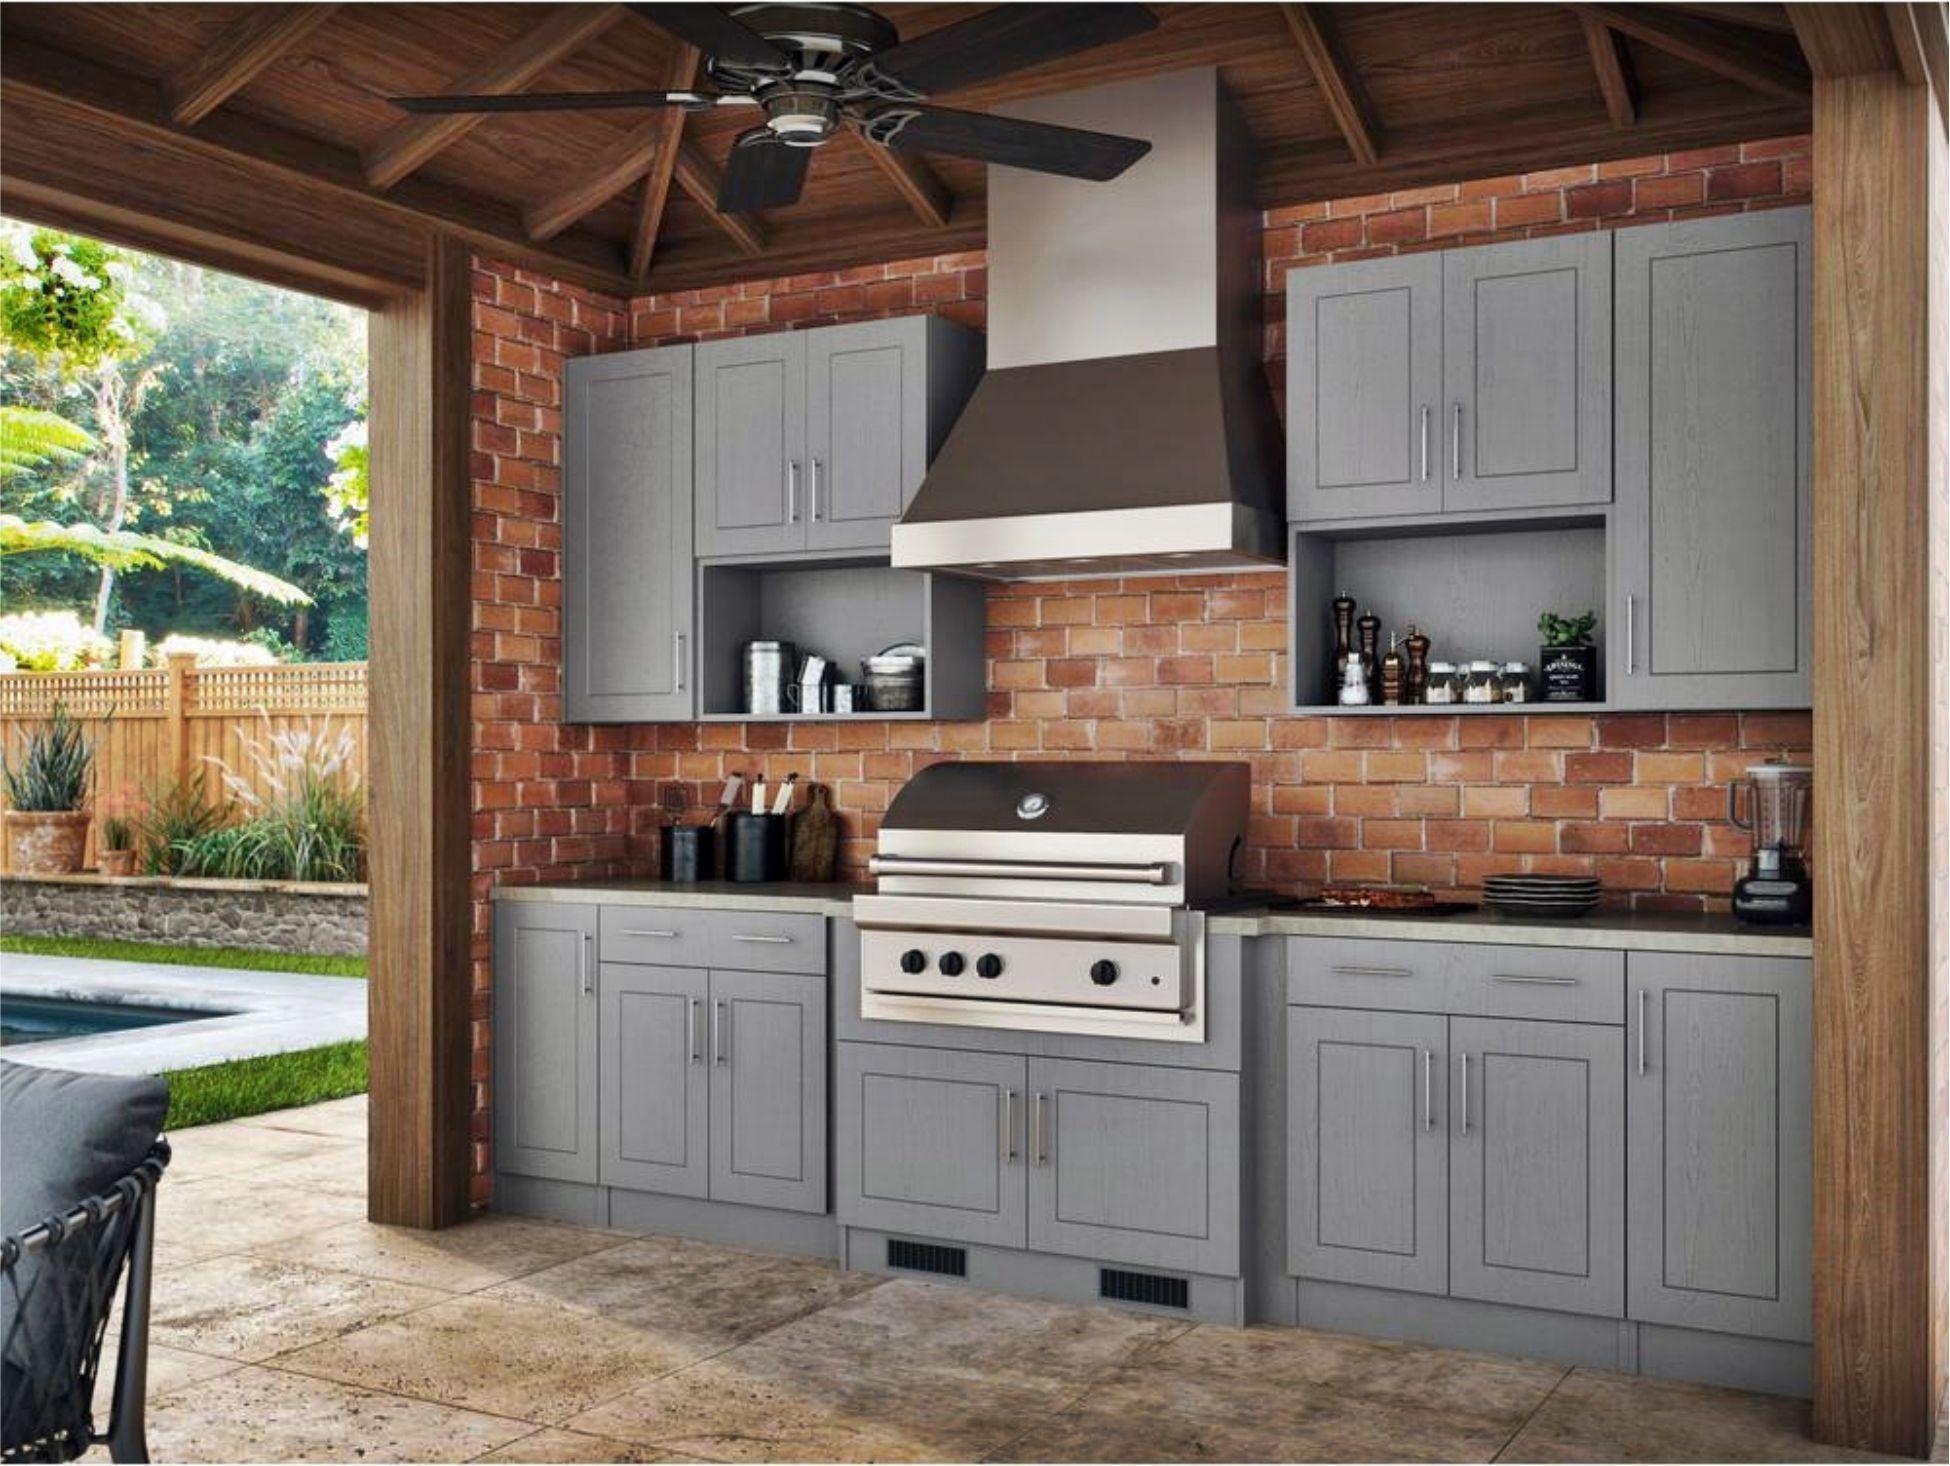 Outdoor Kitchens Pacific Design Outdoor Kitchen Cabinets Outdoor Kitchen Appliances Outdoor Kitchen